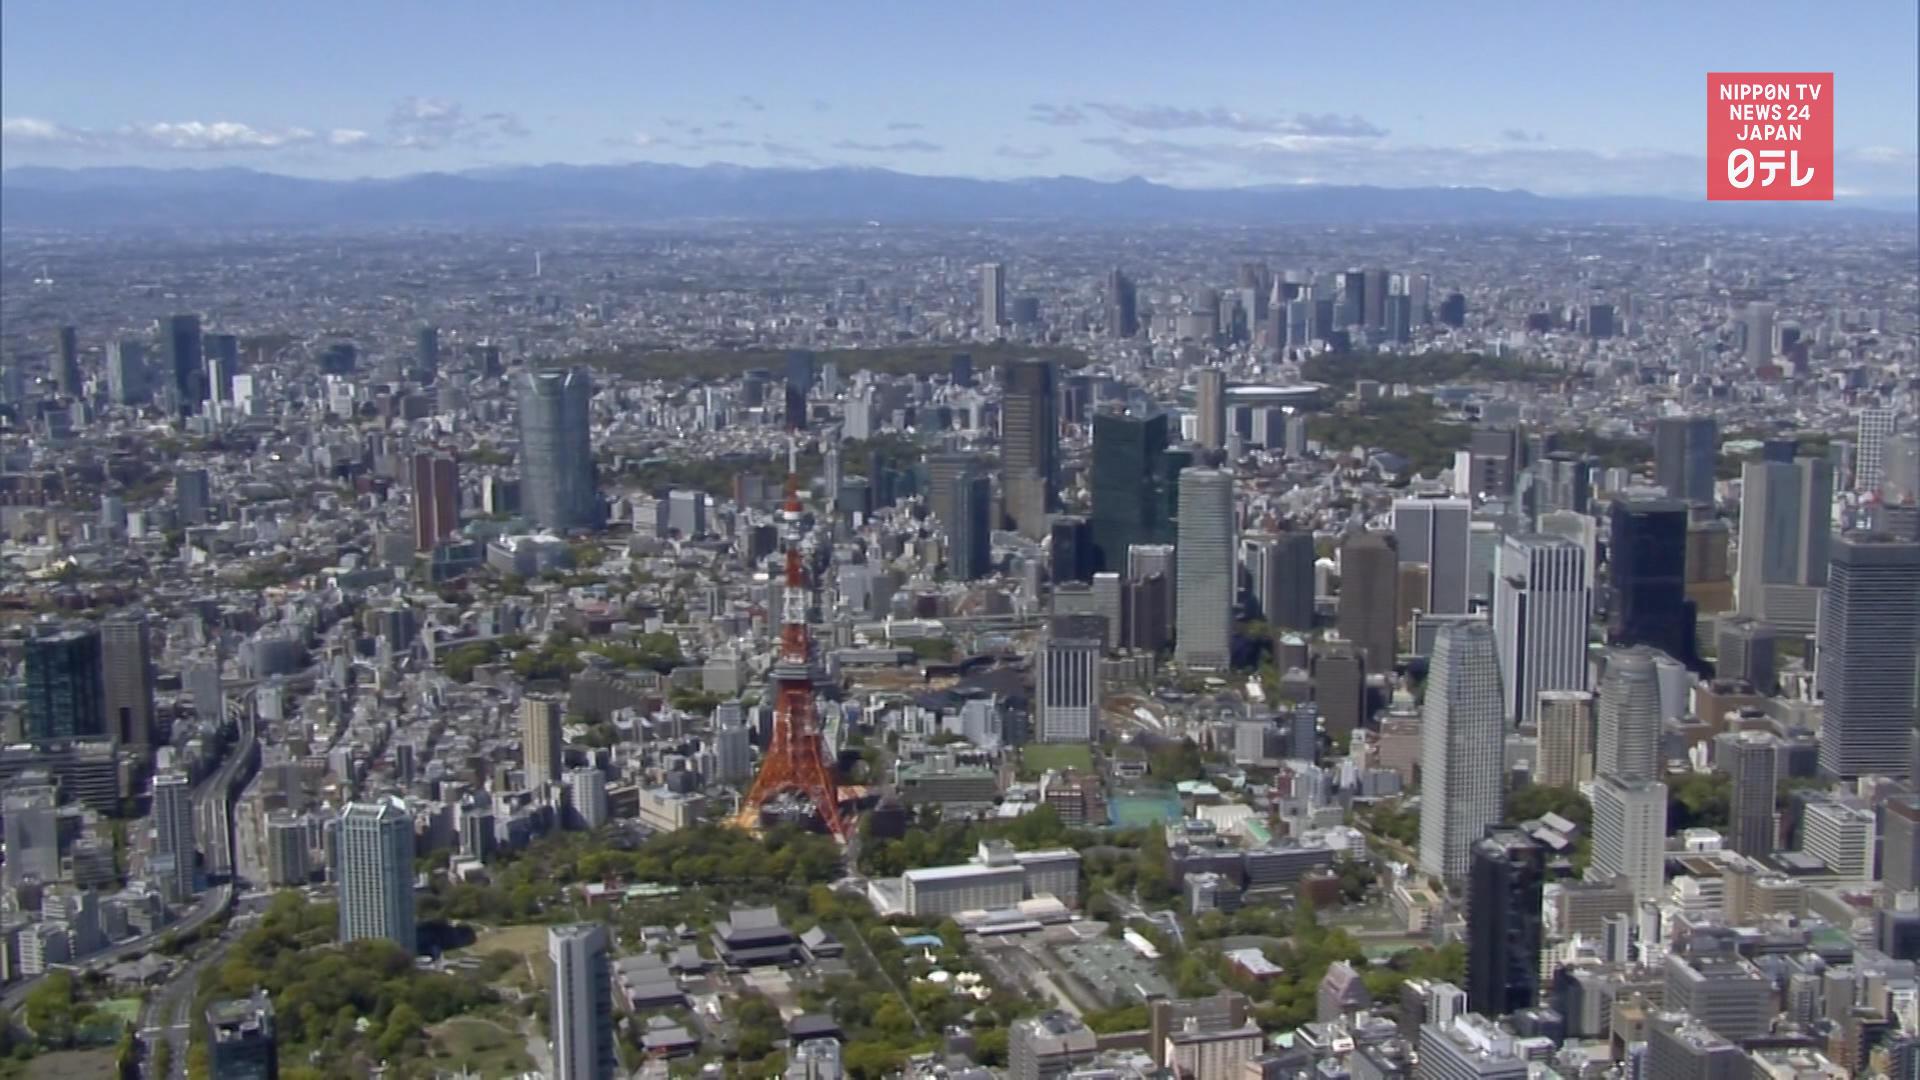 Japan's May household spending down 16.2%